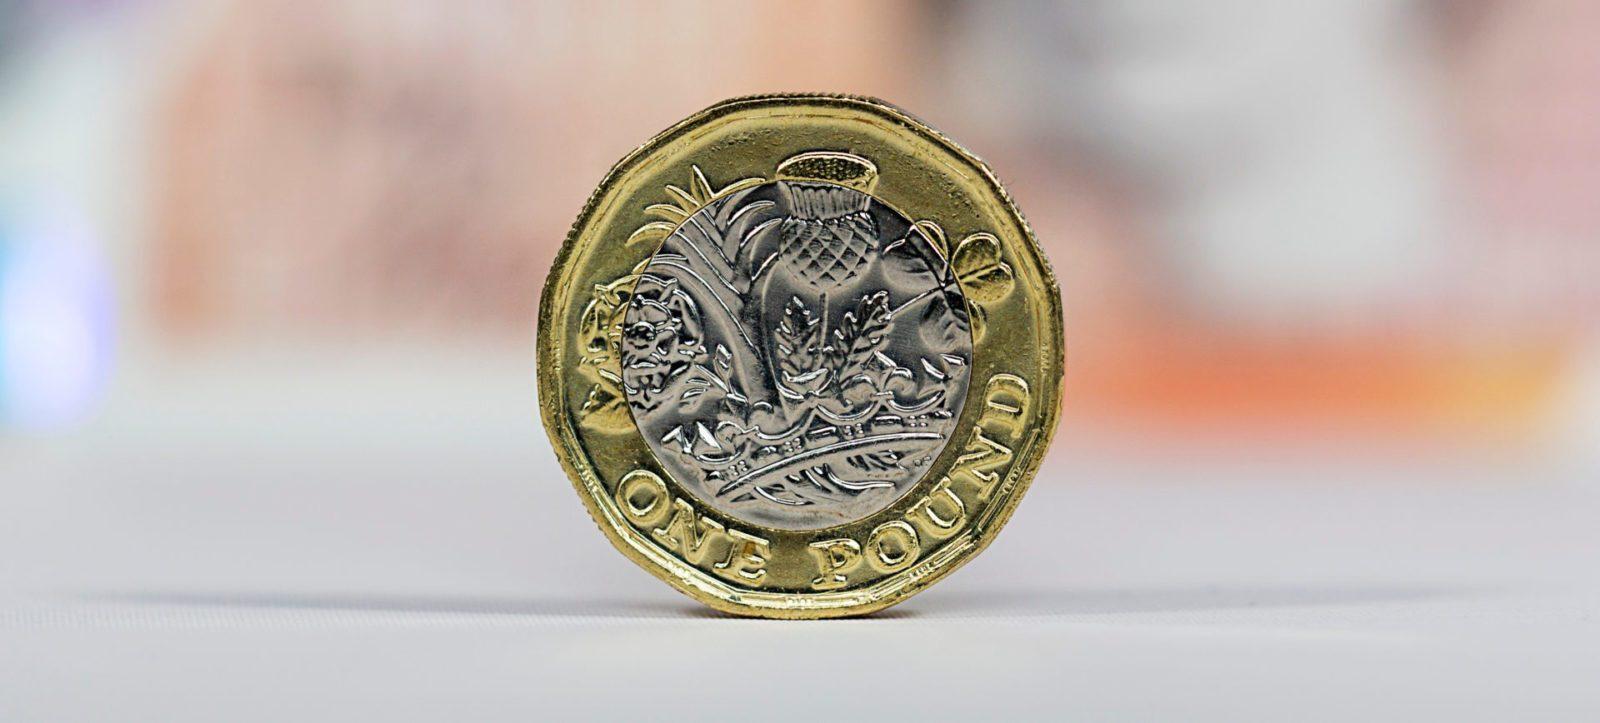 pound data